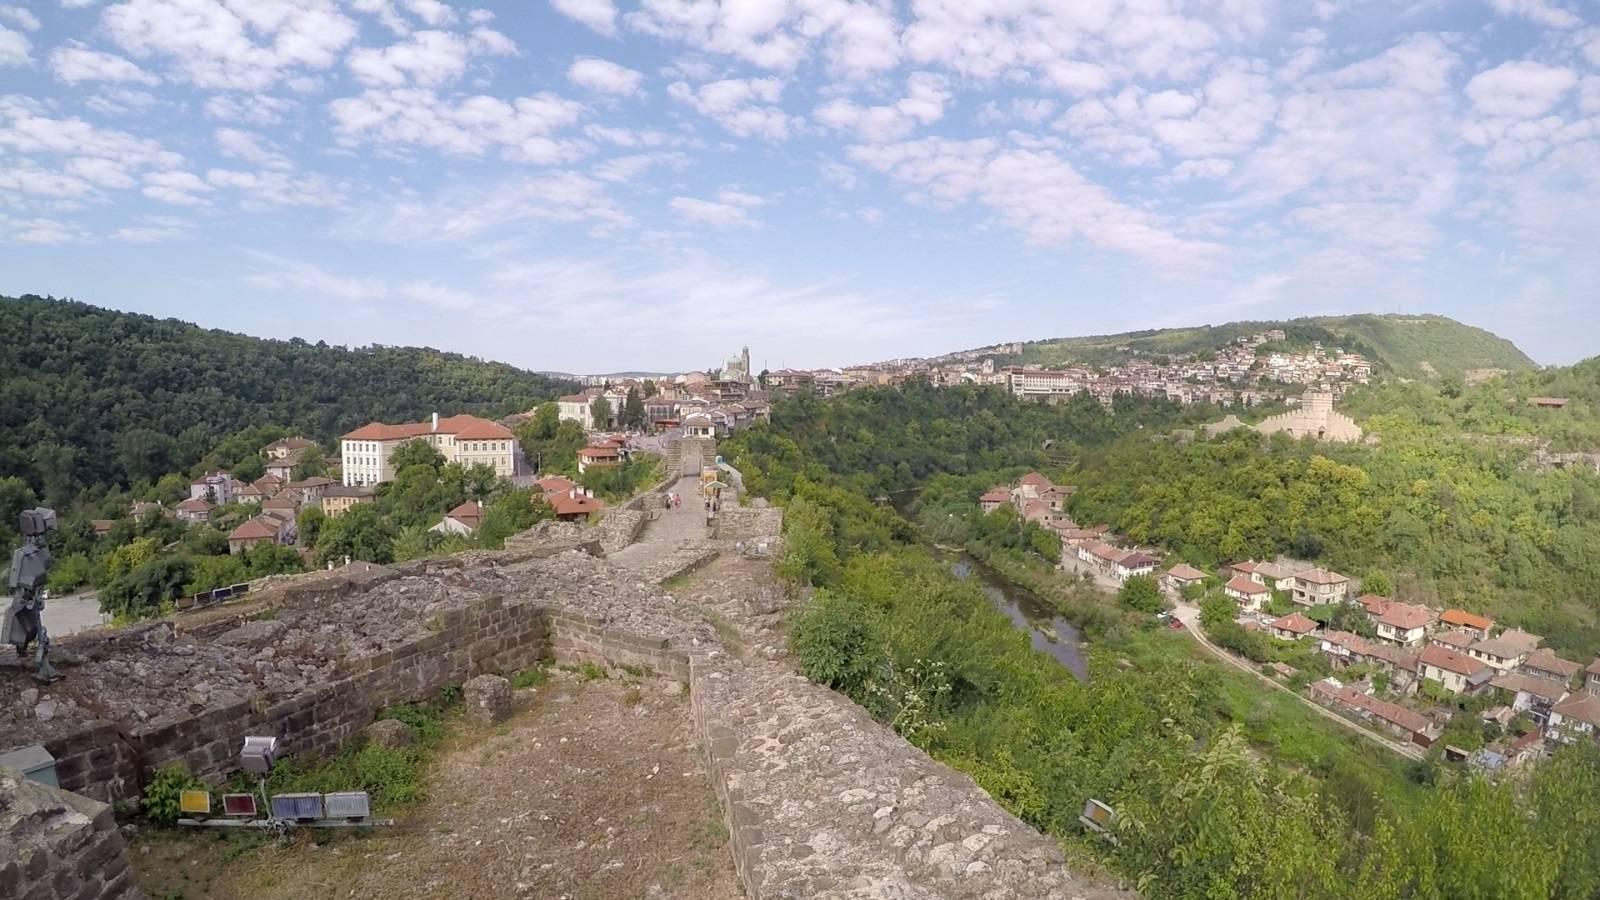 Photo 3: Veliko Tarnovo, ancienne capitale de la Bulgarie